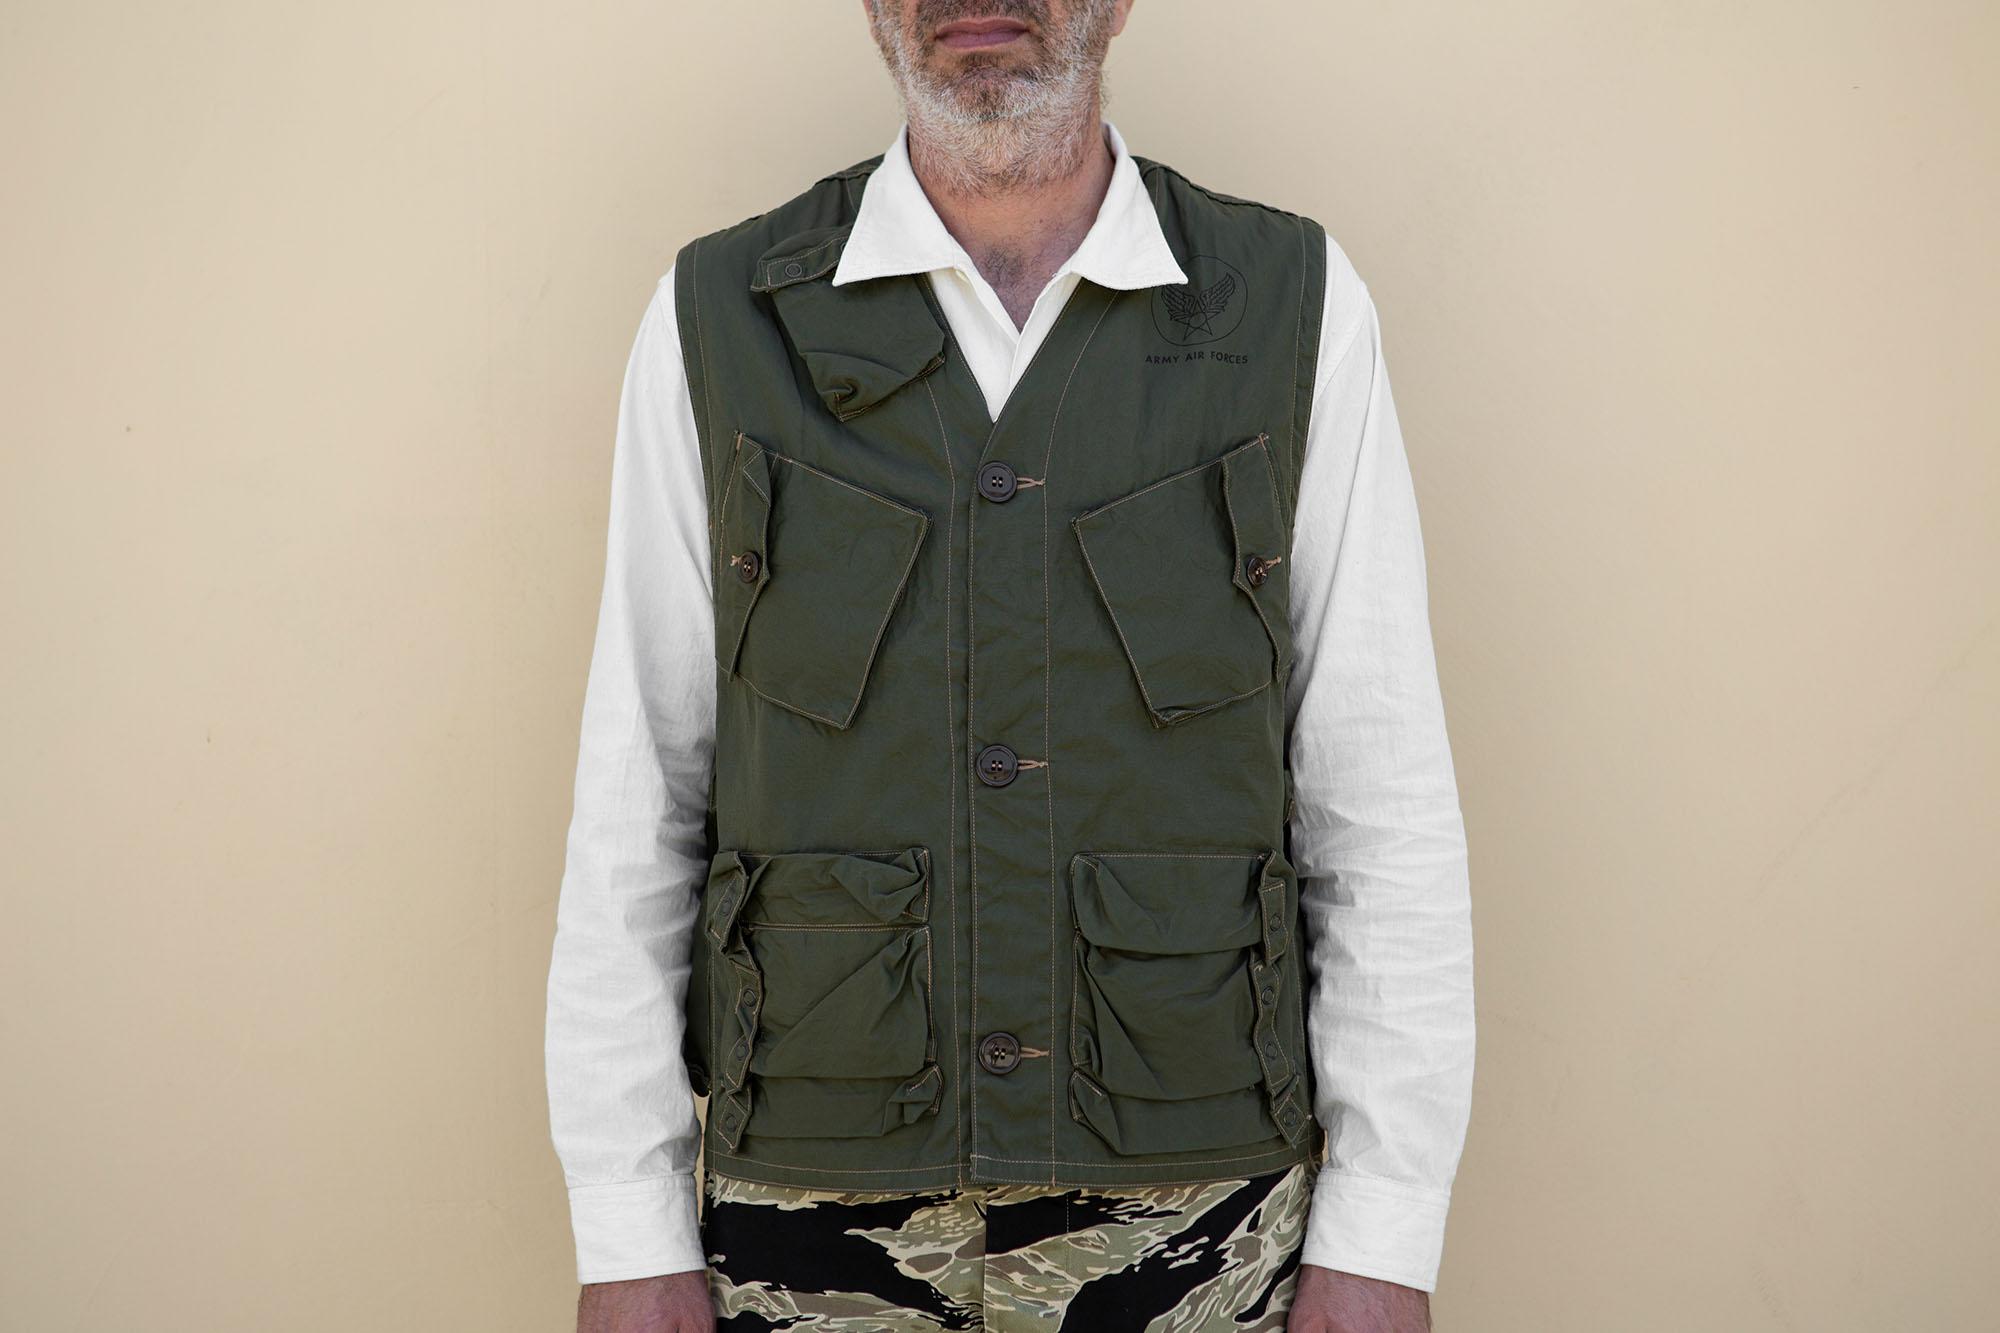 C-1 Civilian Vest Olive Green